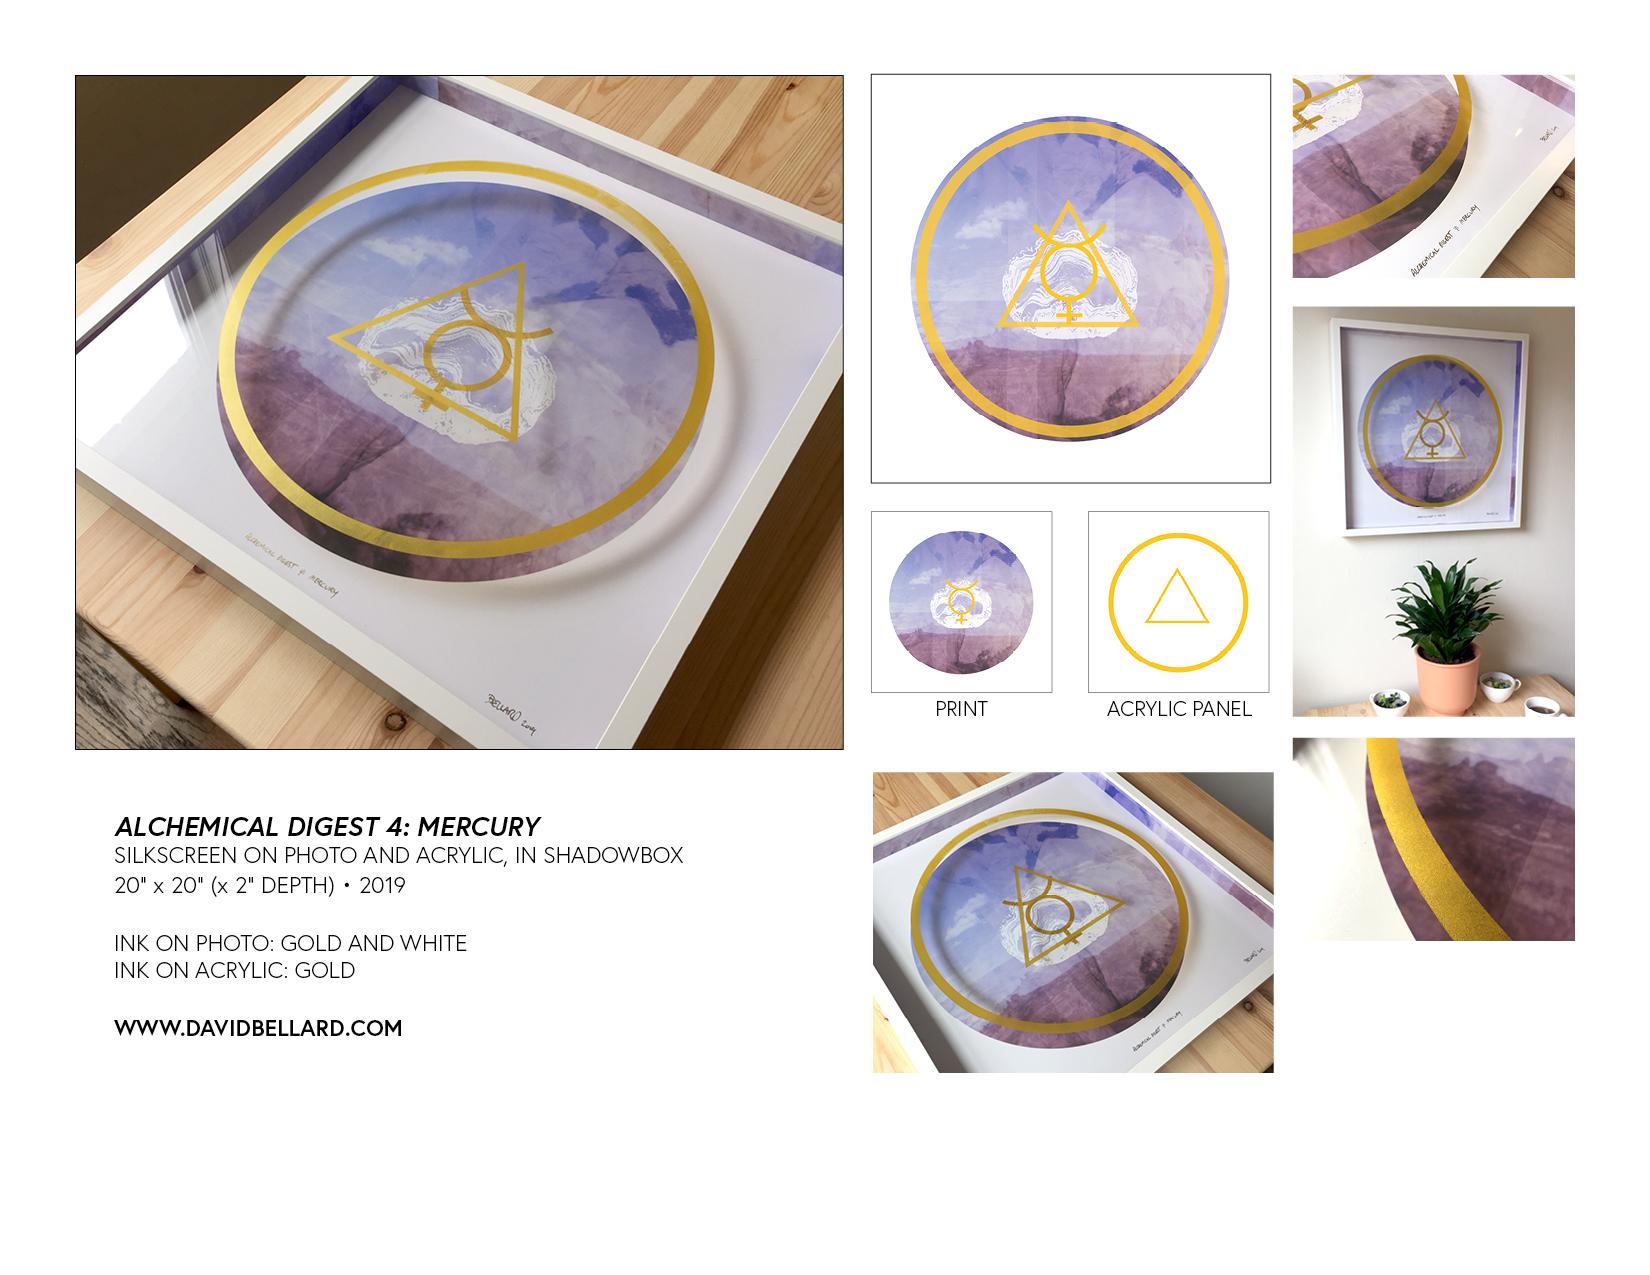 Alchemical Digest Catalog7.jpg